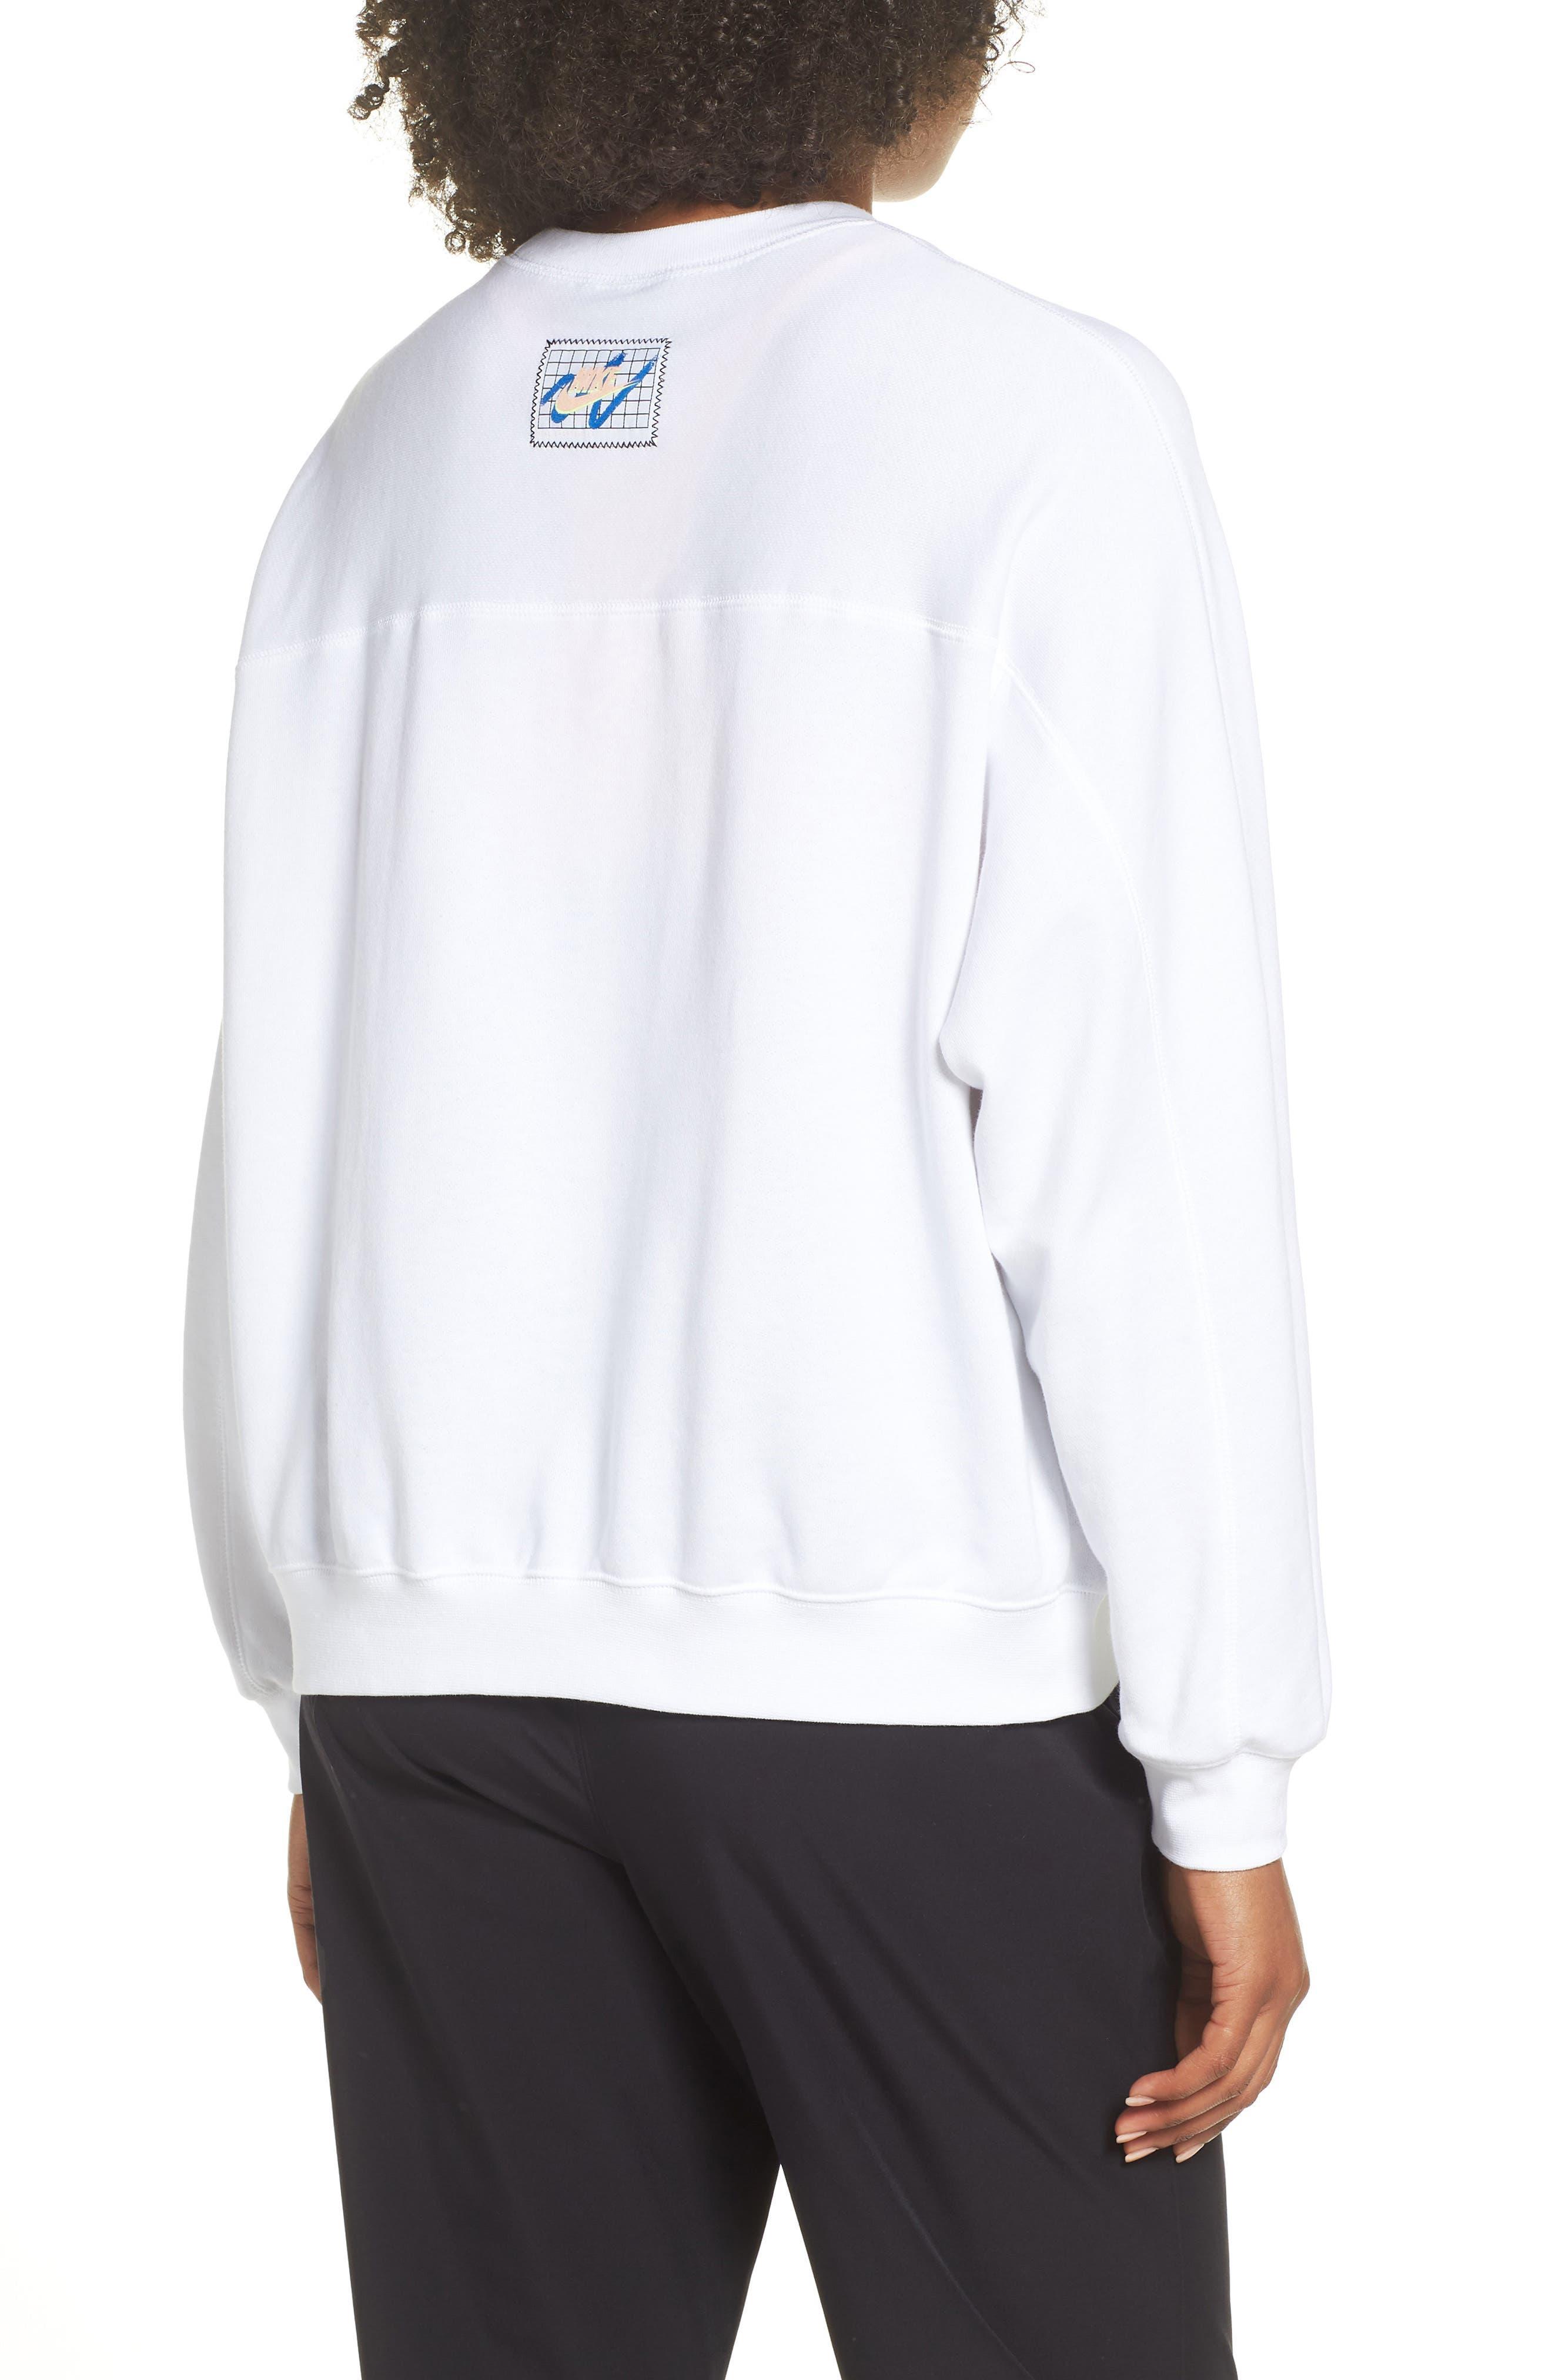 Sportswear Archive Women's Long Sleeve Crewneck Tee,                             Alternate thumbnail 4, color,                             WHITE/ WHITE/ WHITE